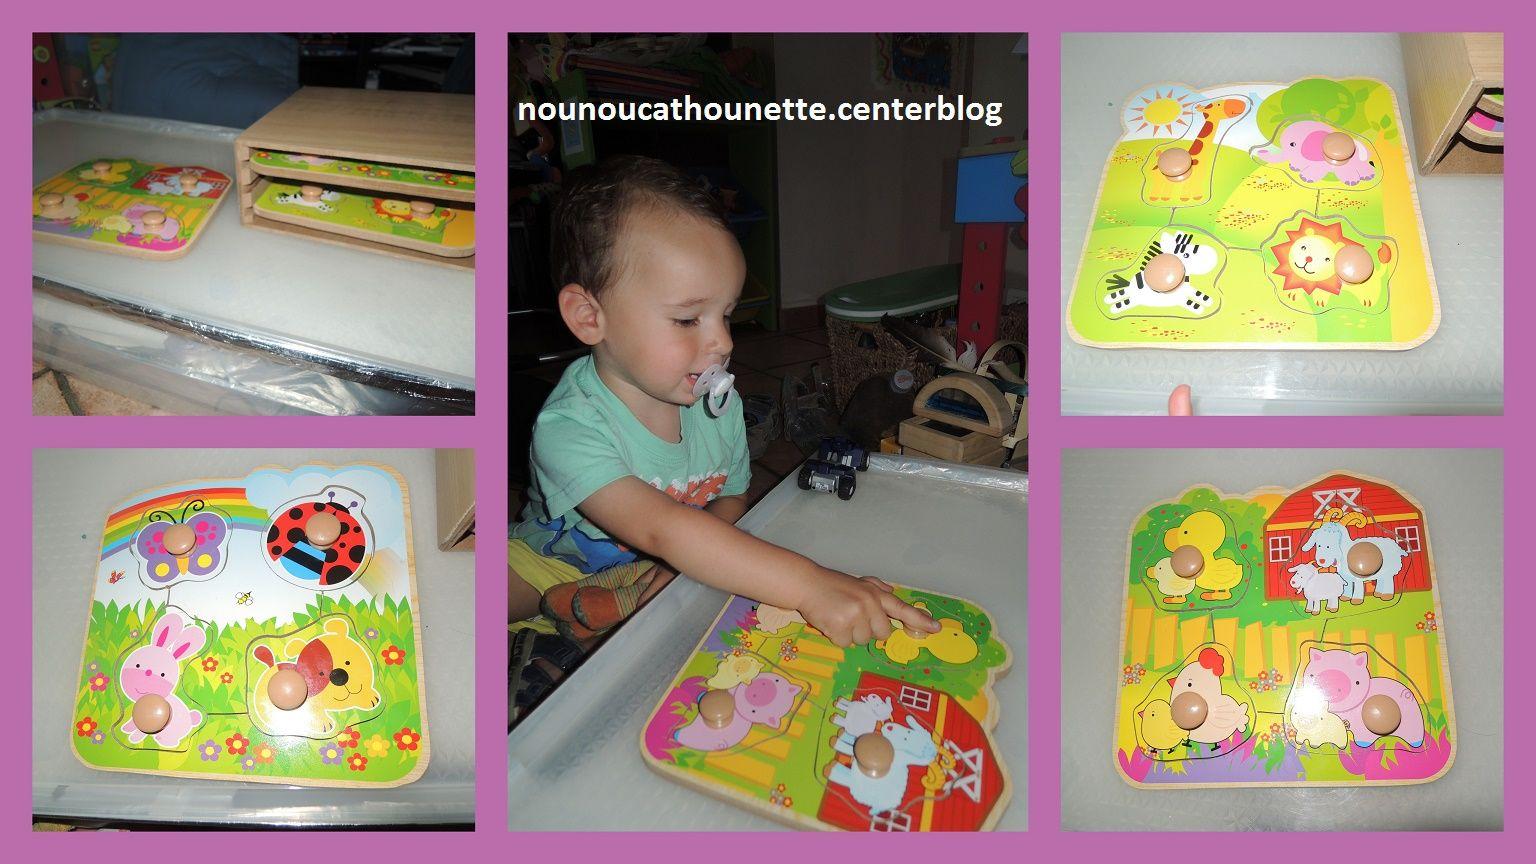 Chez nounou cathy page 9 - Coffret coloriage cars leclerc ...